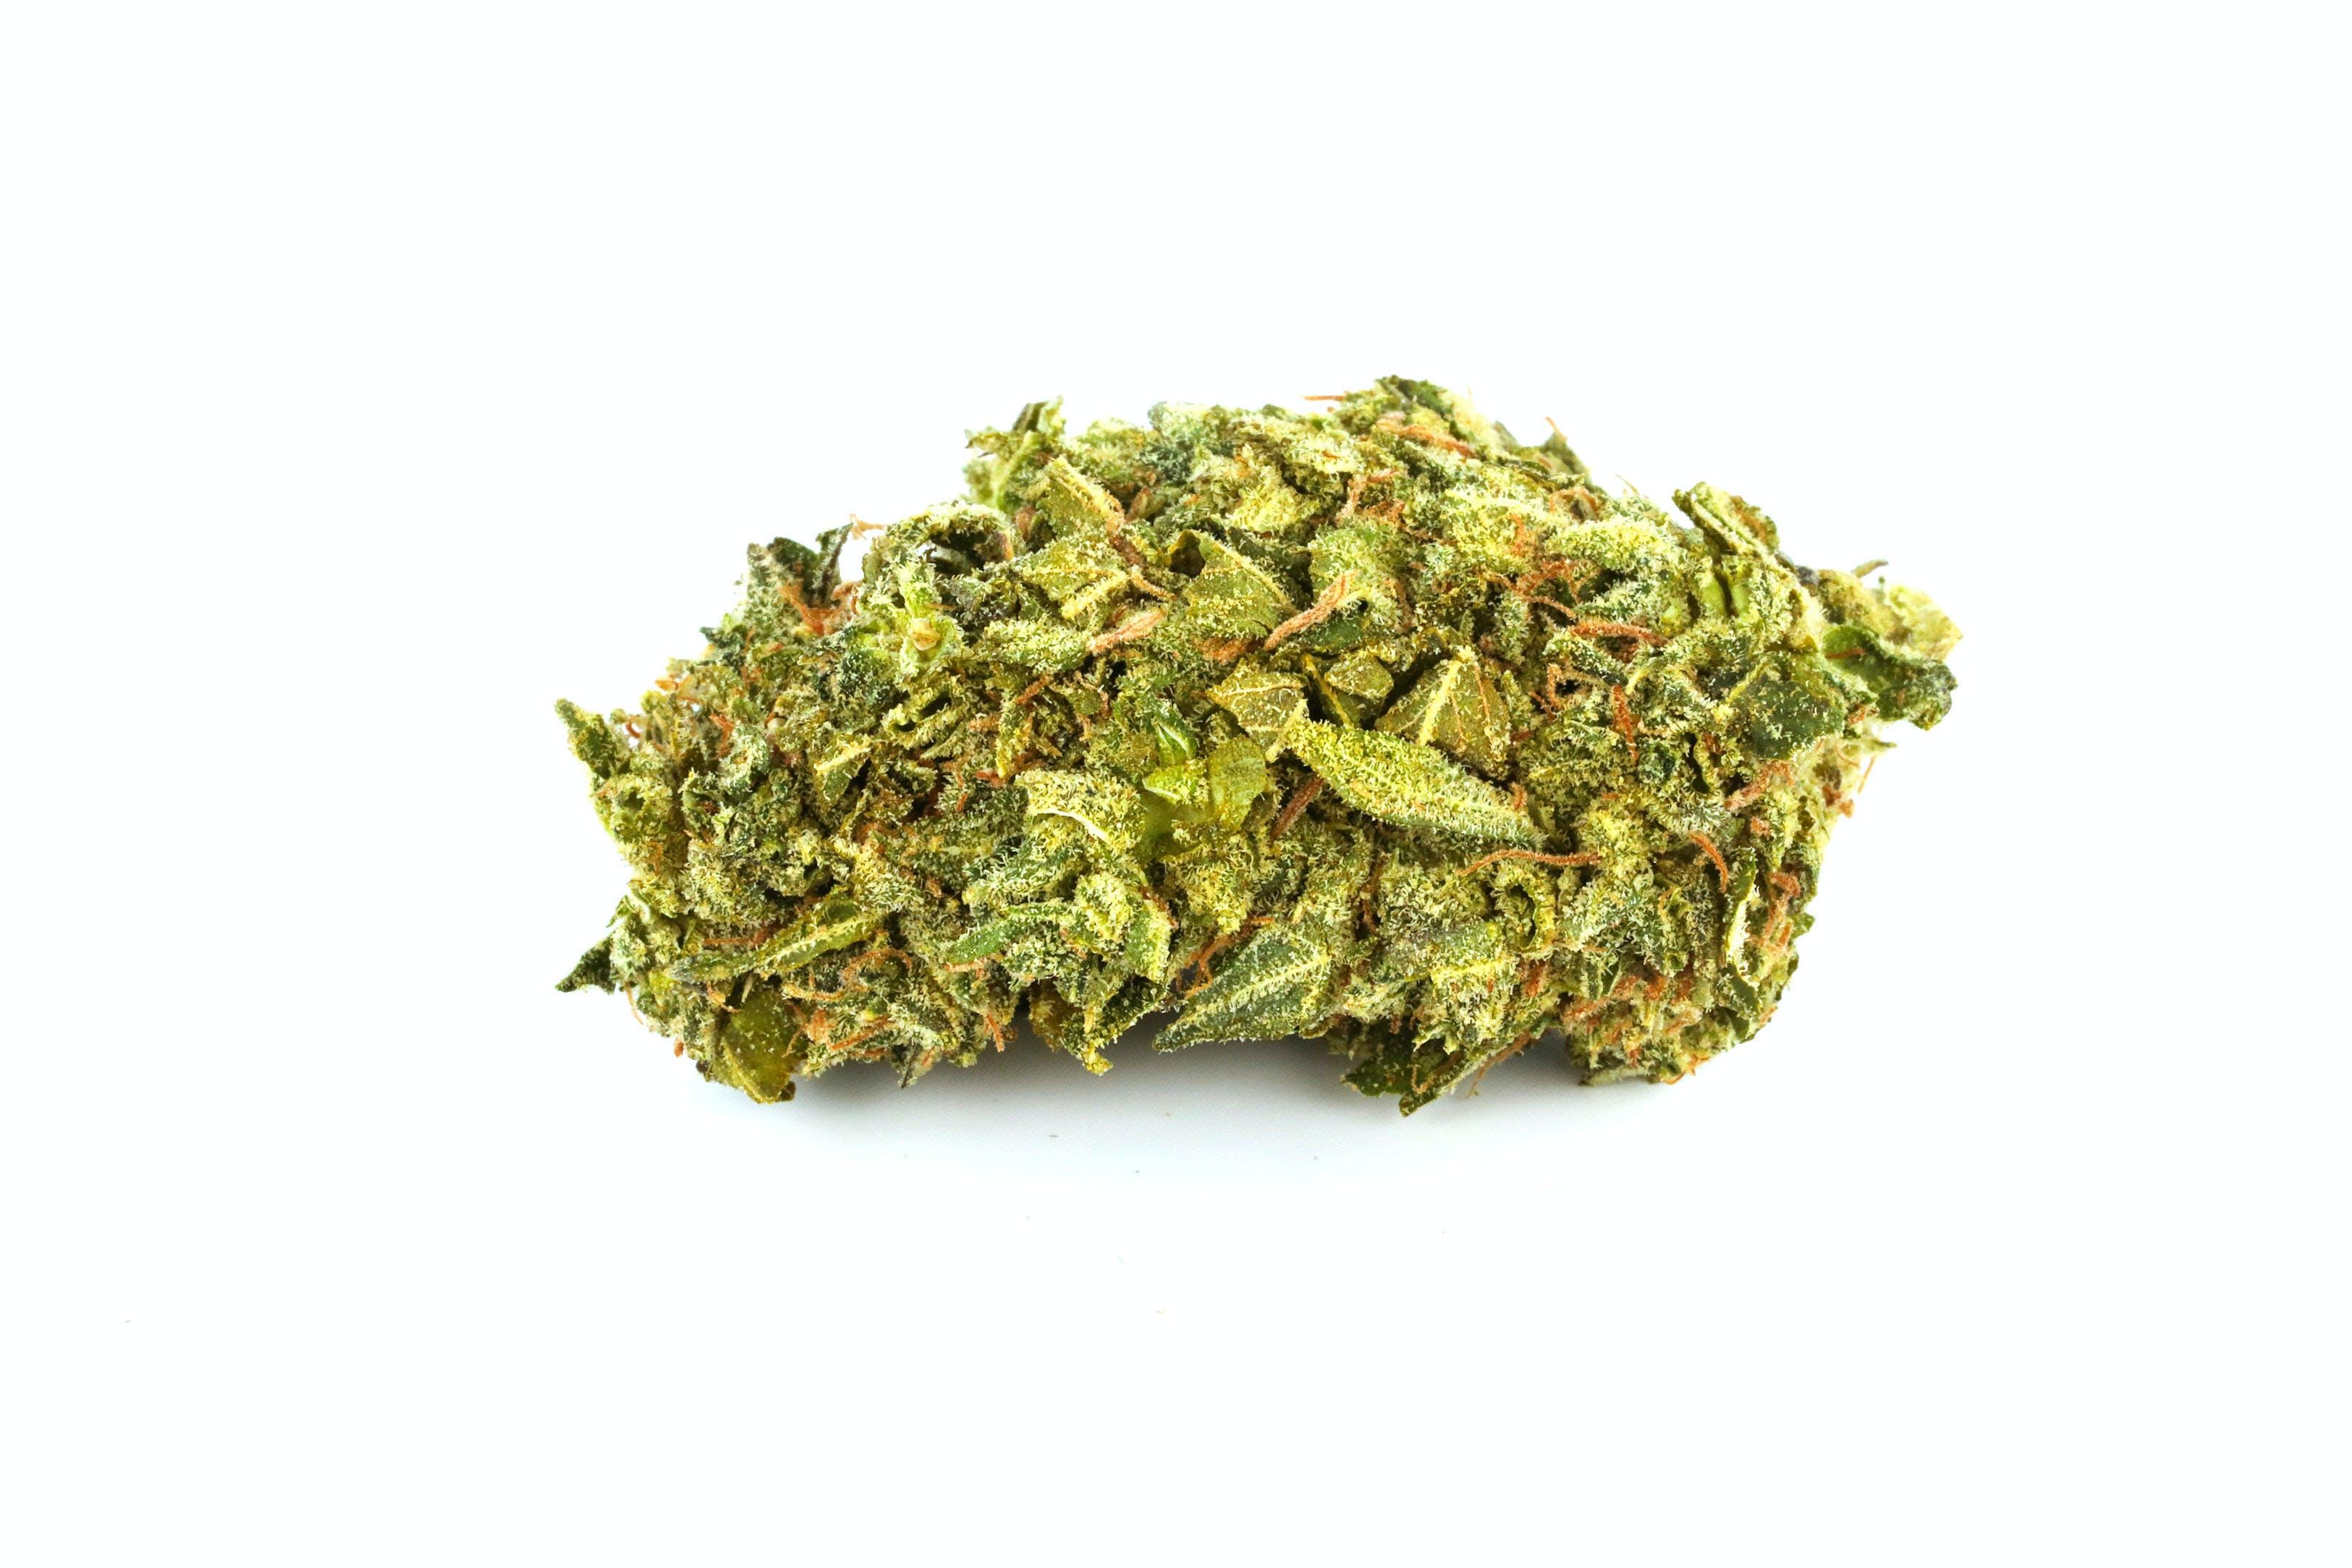 Sour OG Marijuana Strainn copy The Top 5 Cannabis Strains for Hangover Symptoms